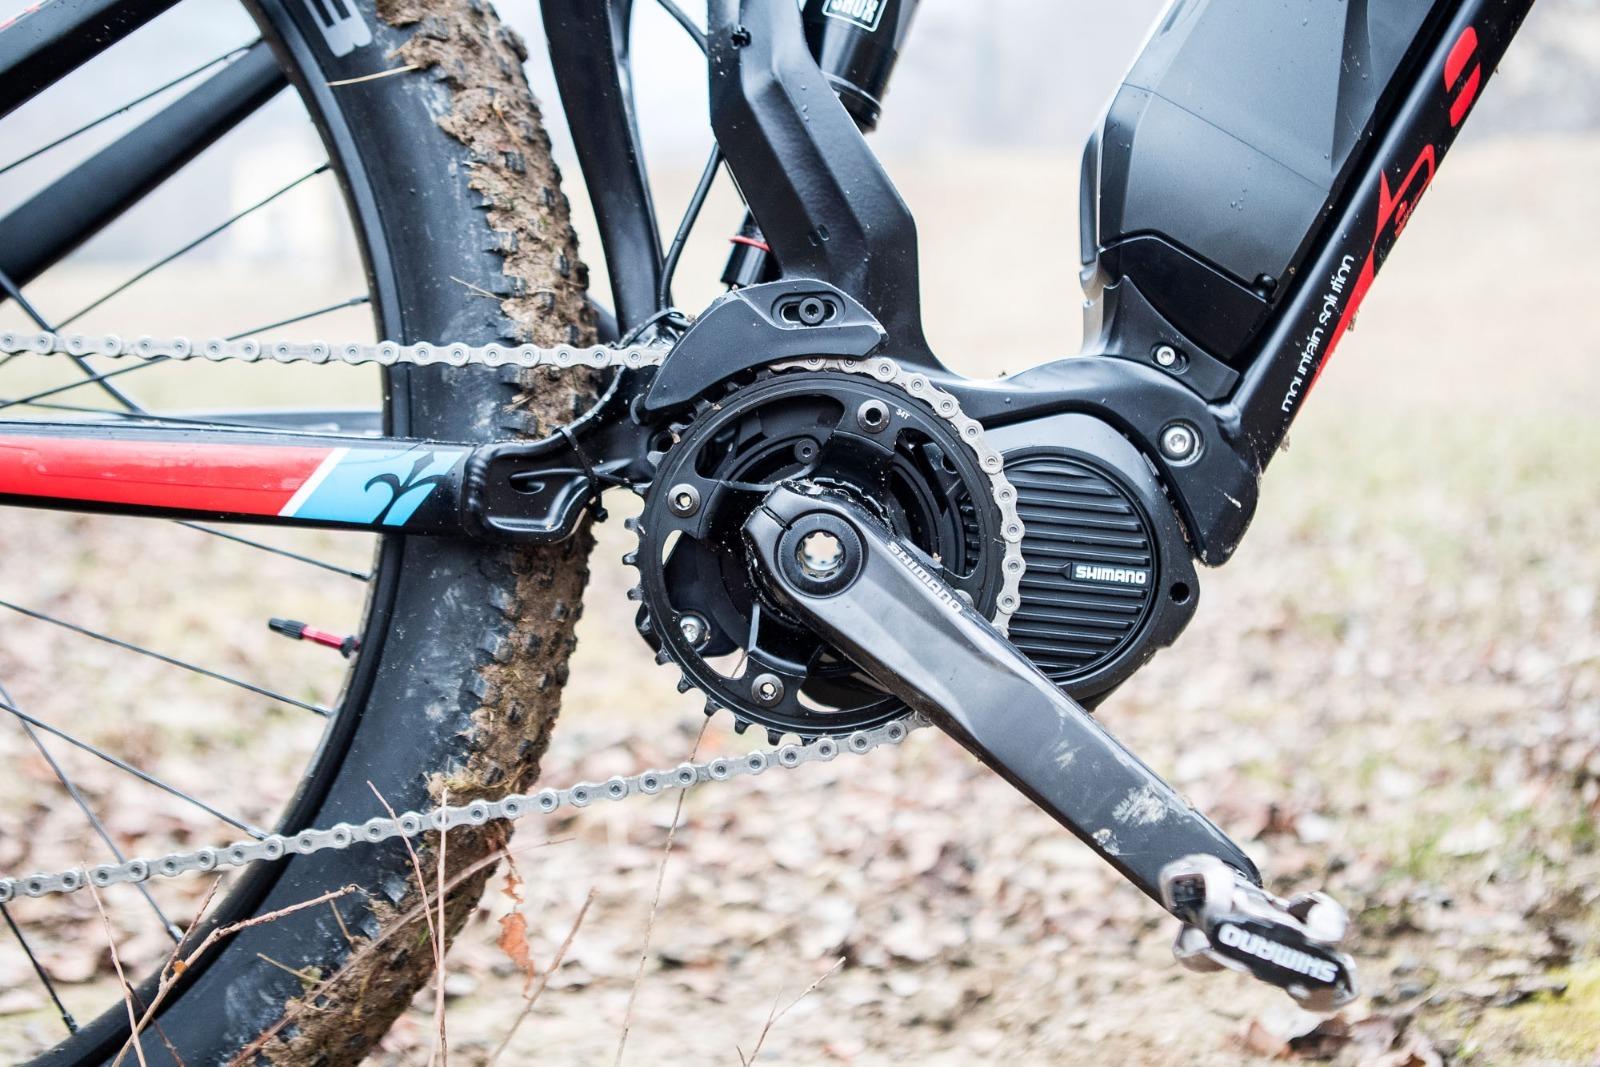 WILIER E803TRB PRO XT Full - Noleggio bici Follina